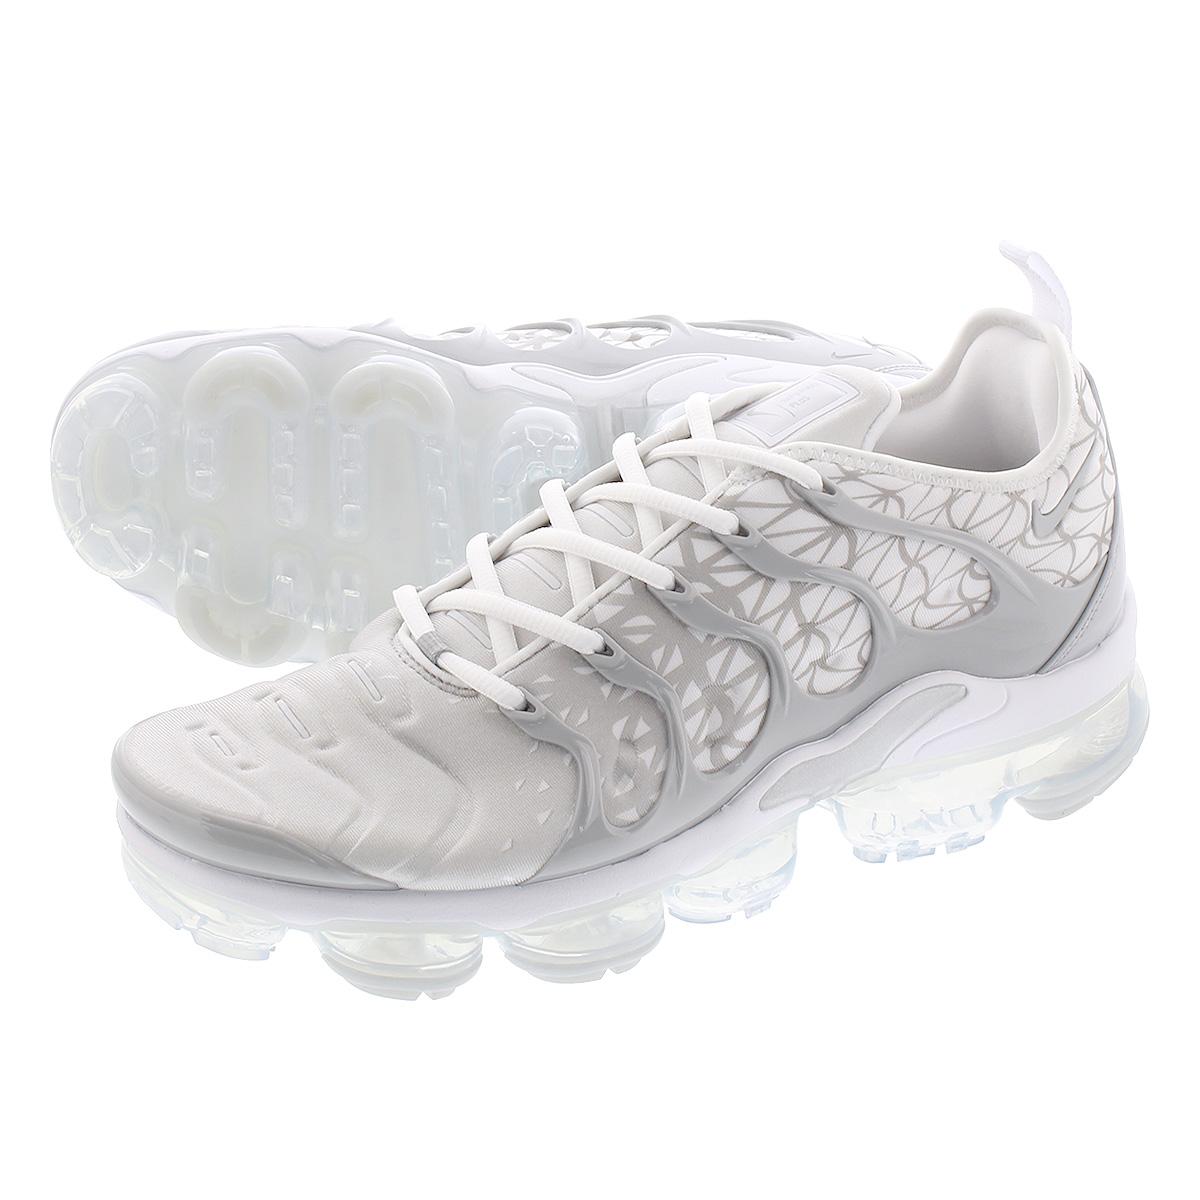 best service 1f646 c3314 NIKE AIR VAPORMAX PLUS Nike vapor max plus WHITE/METALLIC SILVER/WOLF GREY  924,453-106